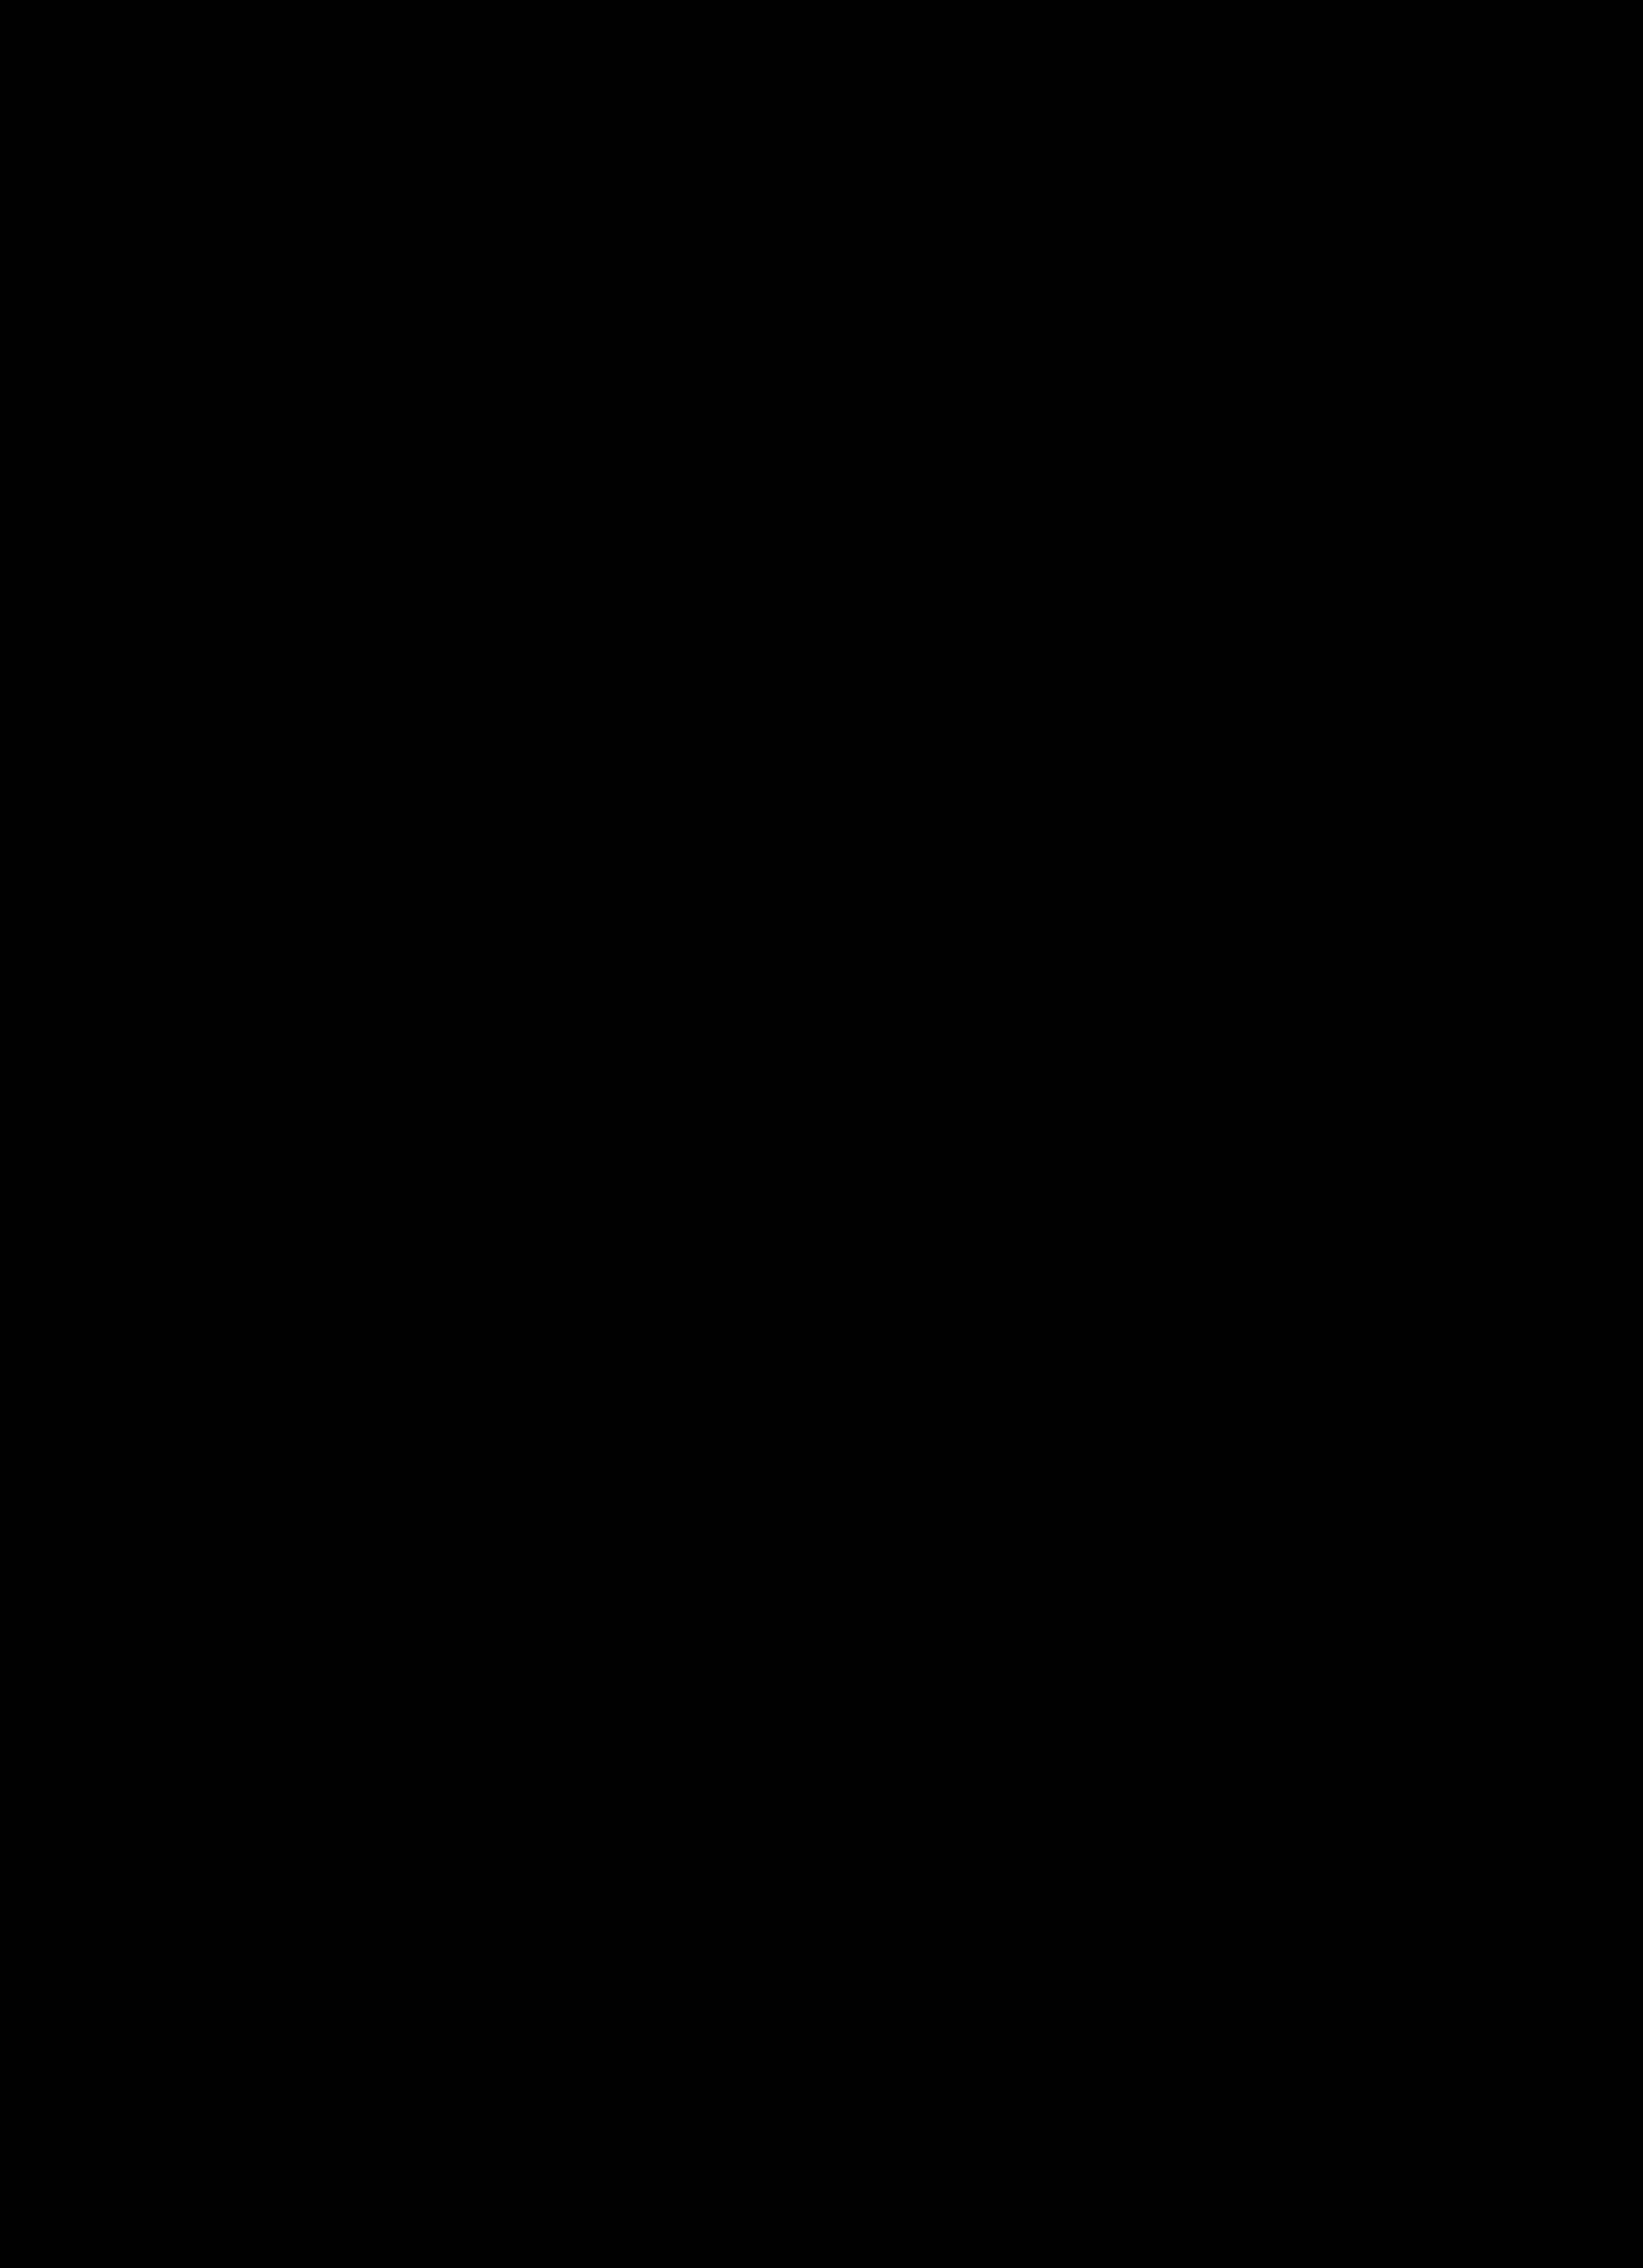 1704x2352 Clipart